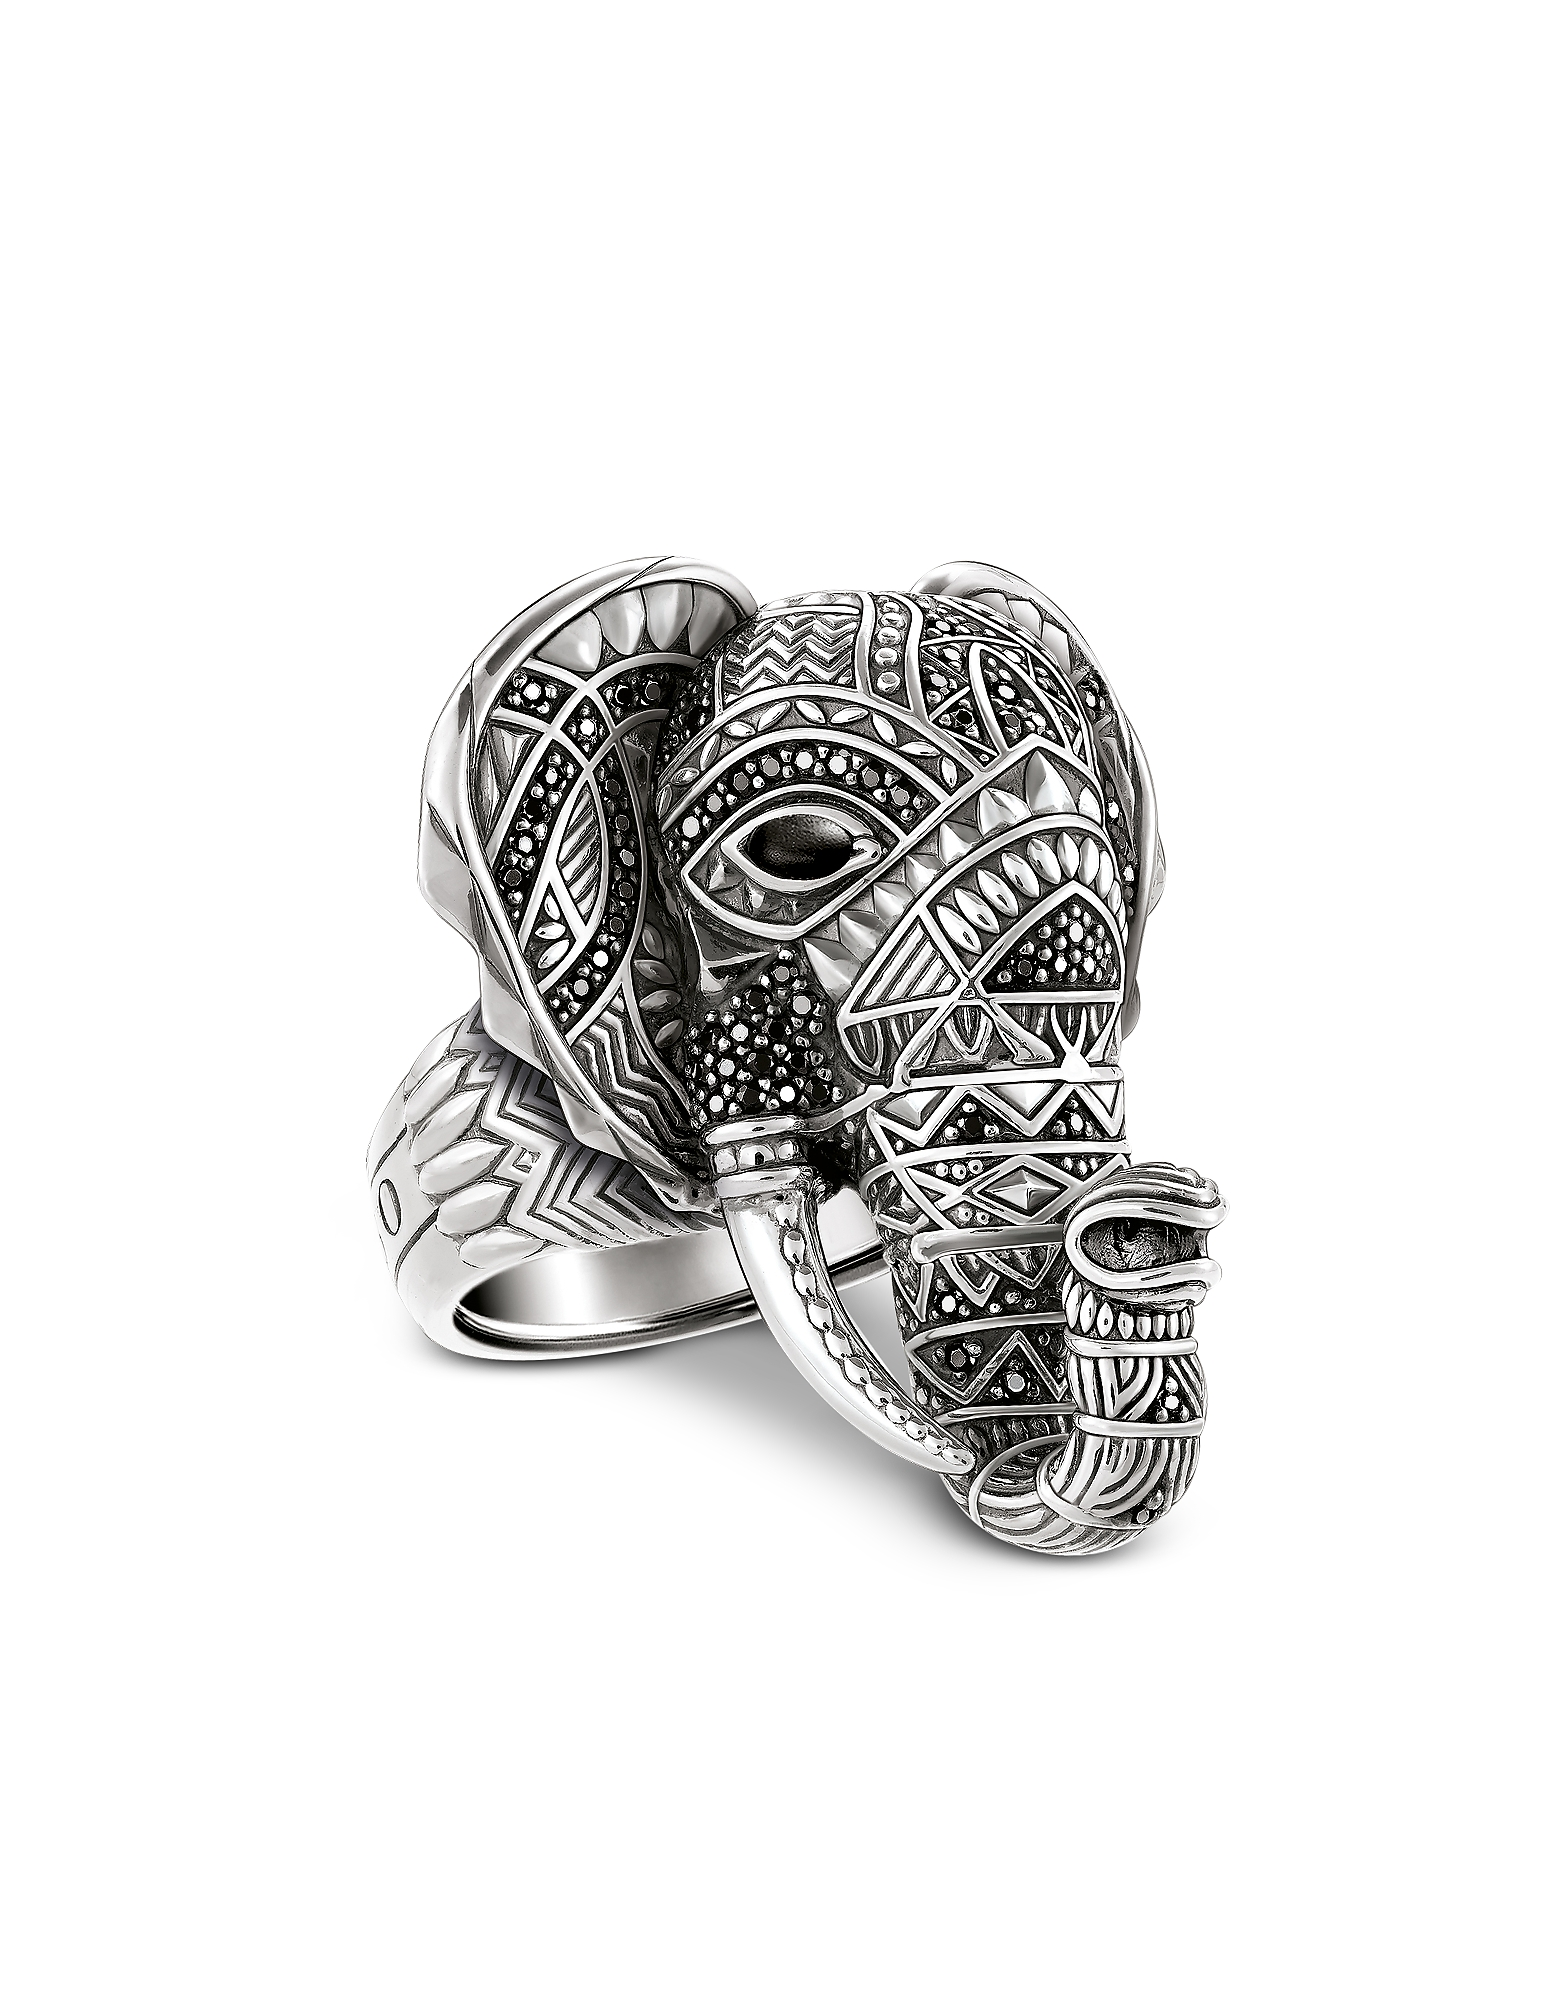 Thomas Sabo Rings, Blackened Sterling Silver Elephant Ring w/Black Zirconia Pavè